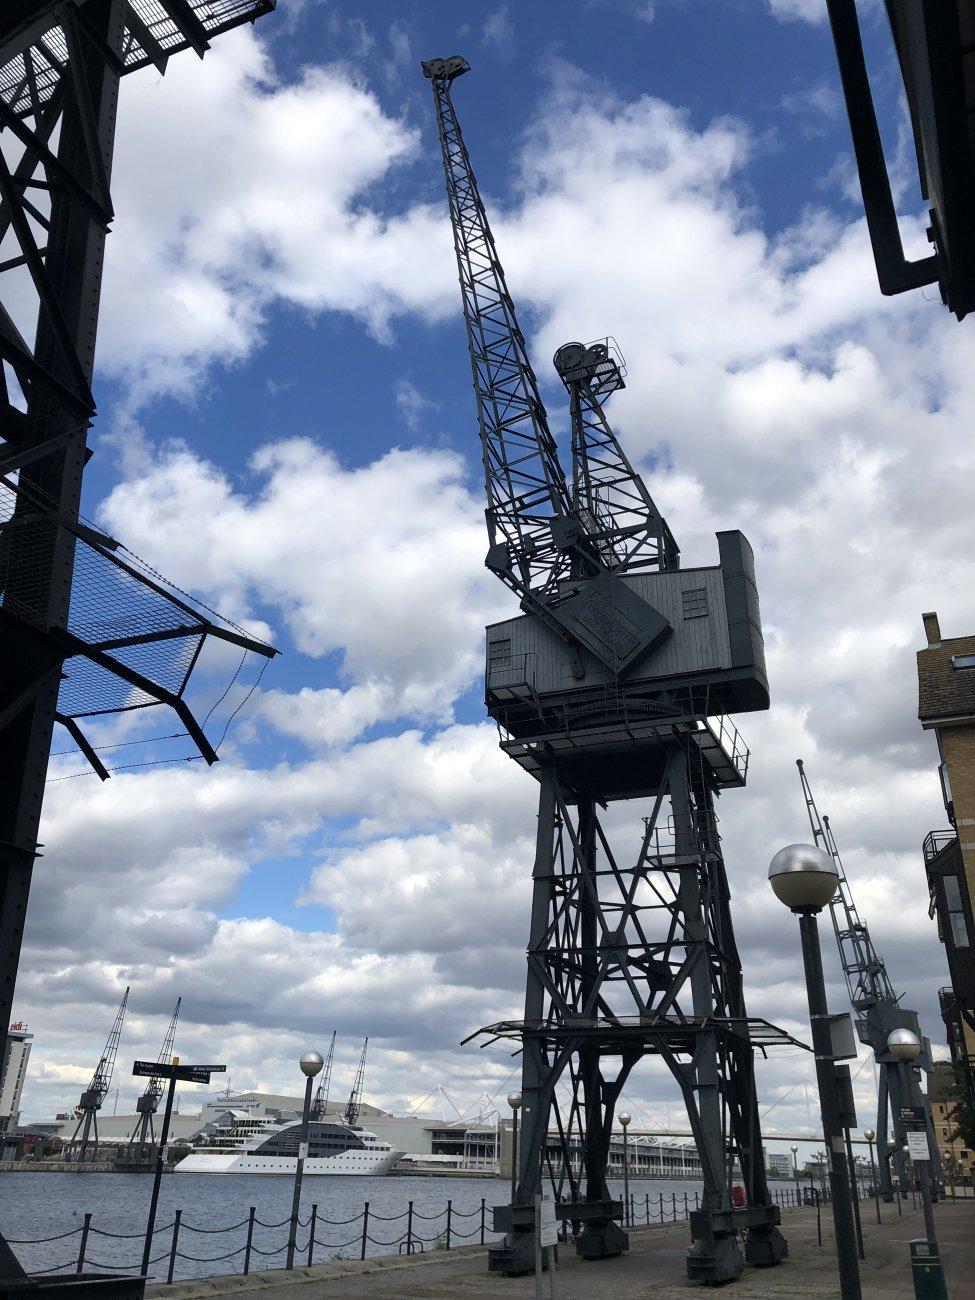 Crane At The Dock